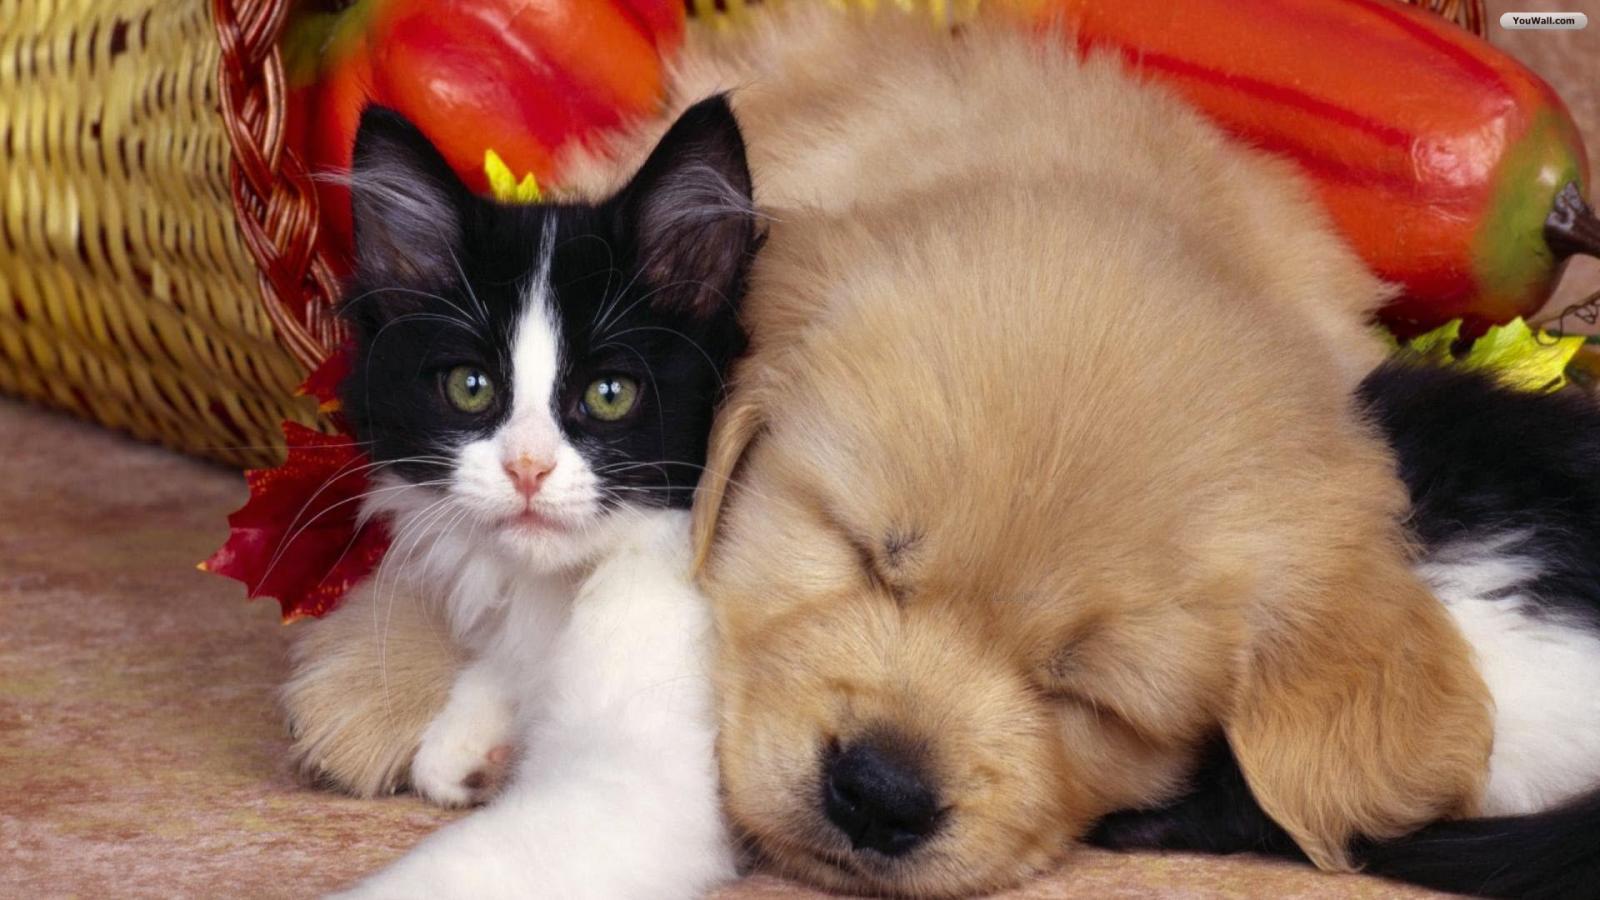 Cute Cat and Dog Wallpaper   wallpaperwallpapersfree wallpaper 1600x900